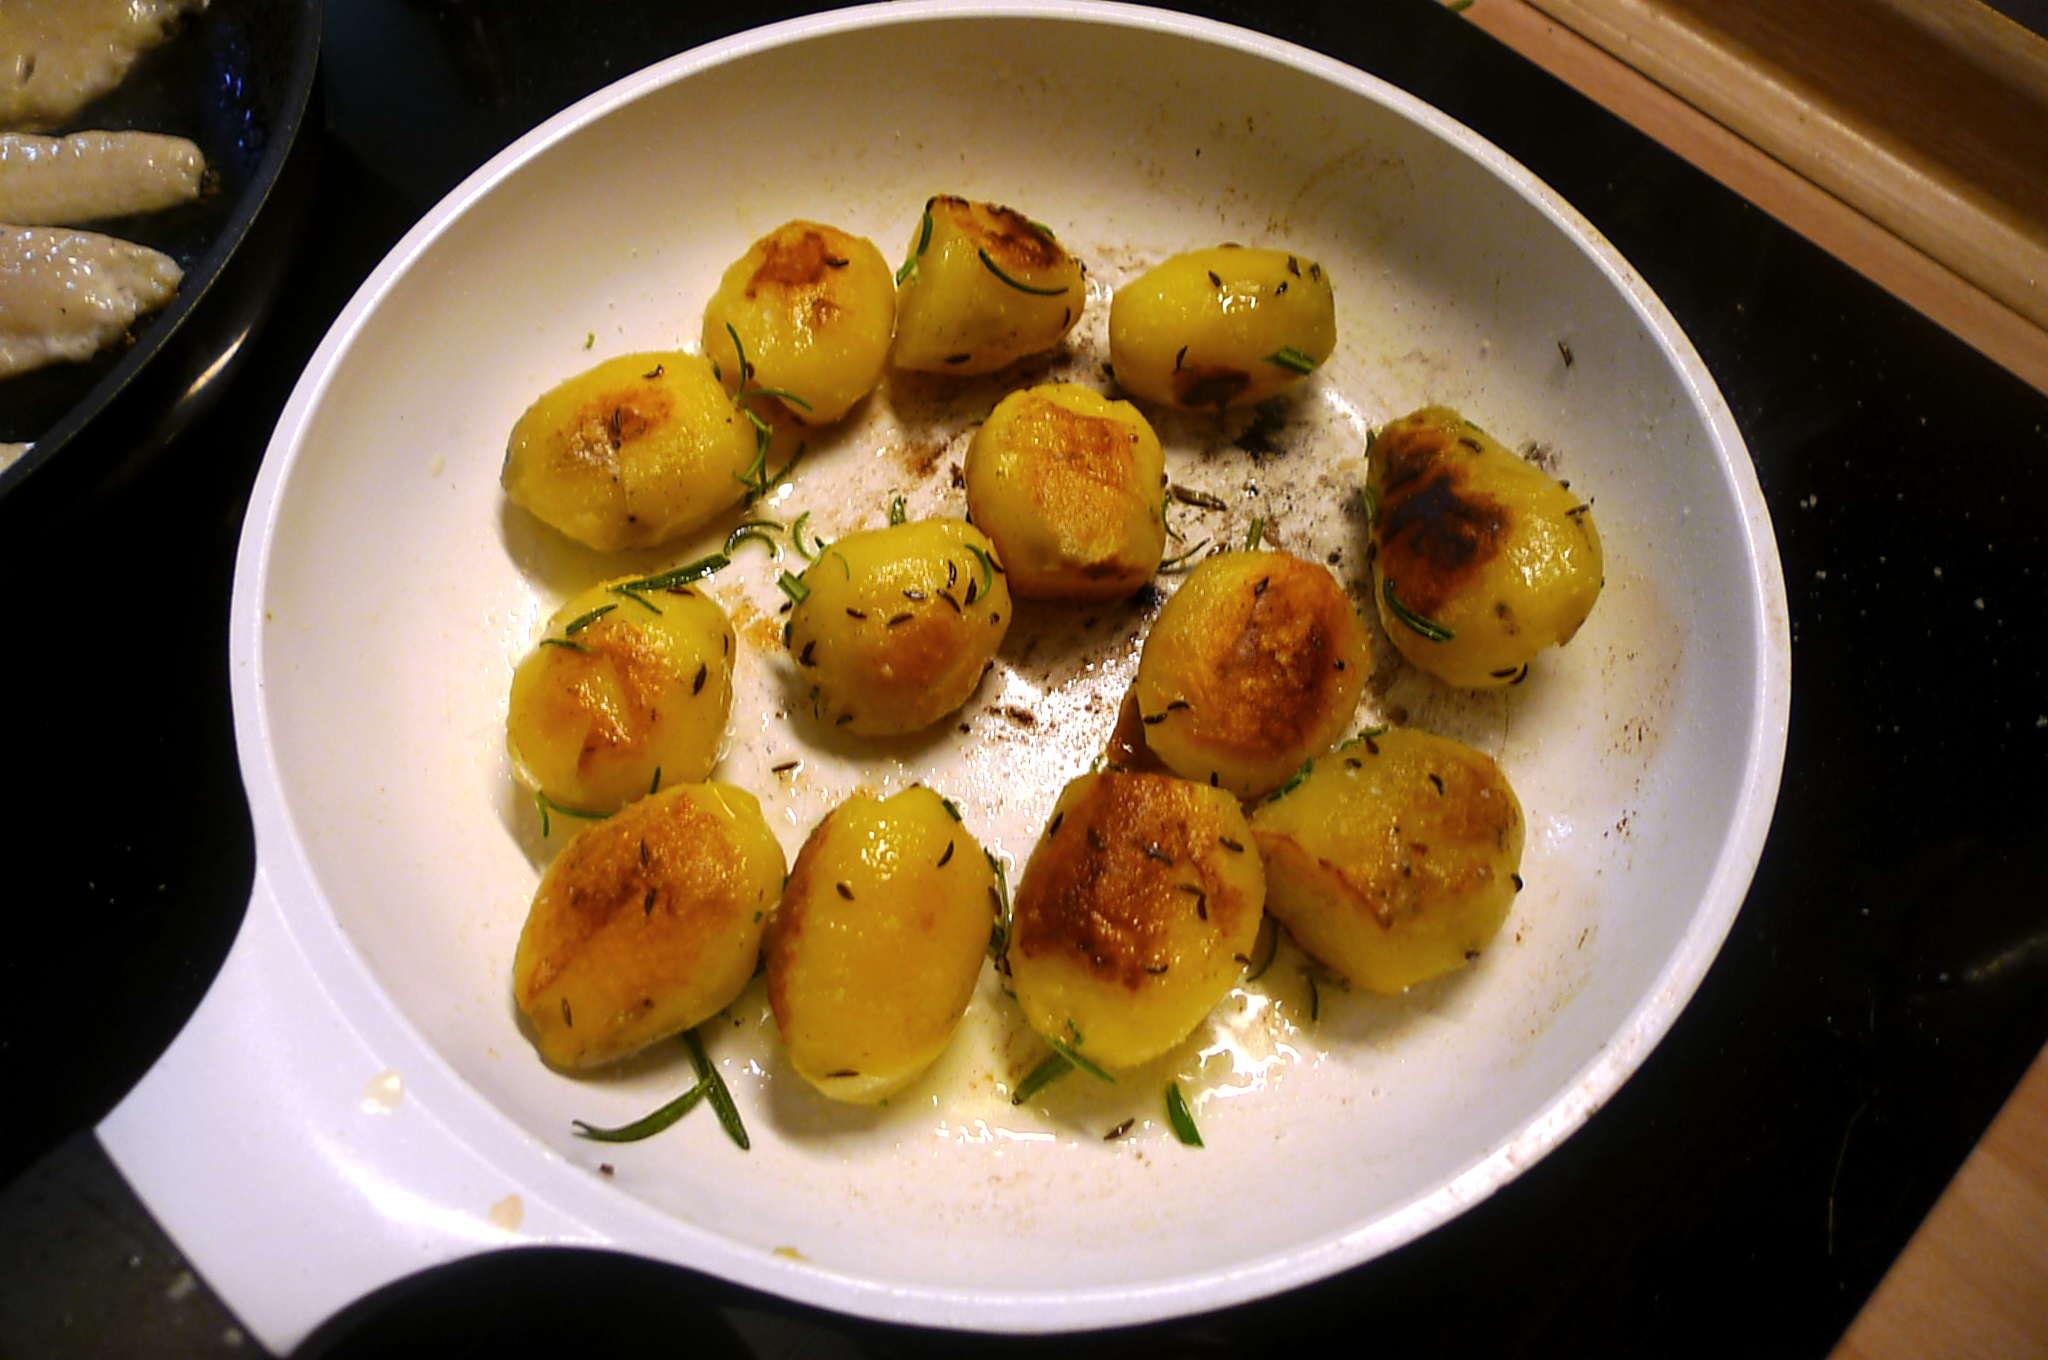 9.2.16 - Zander,Salat,Kartoffel,pescetarisch (1c) (4a)